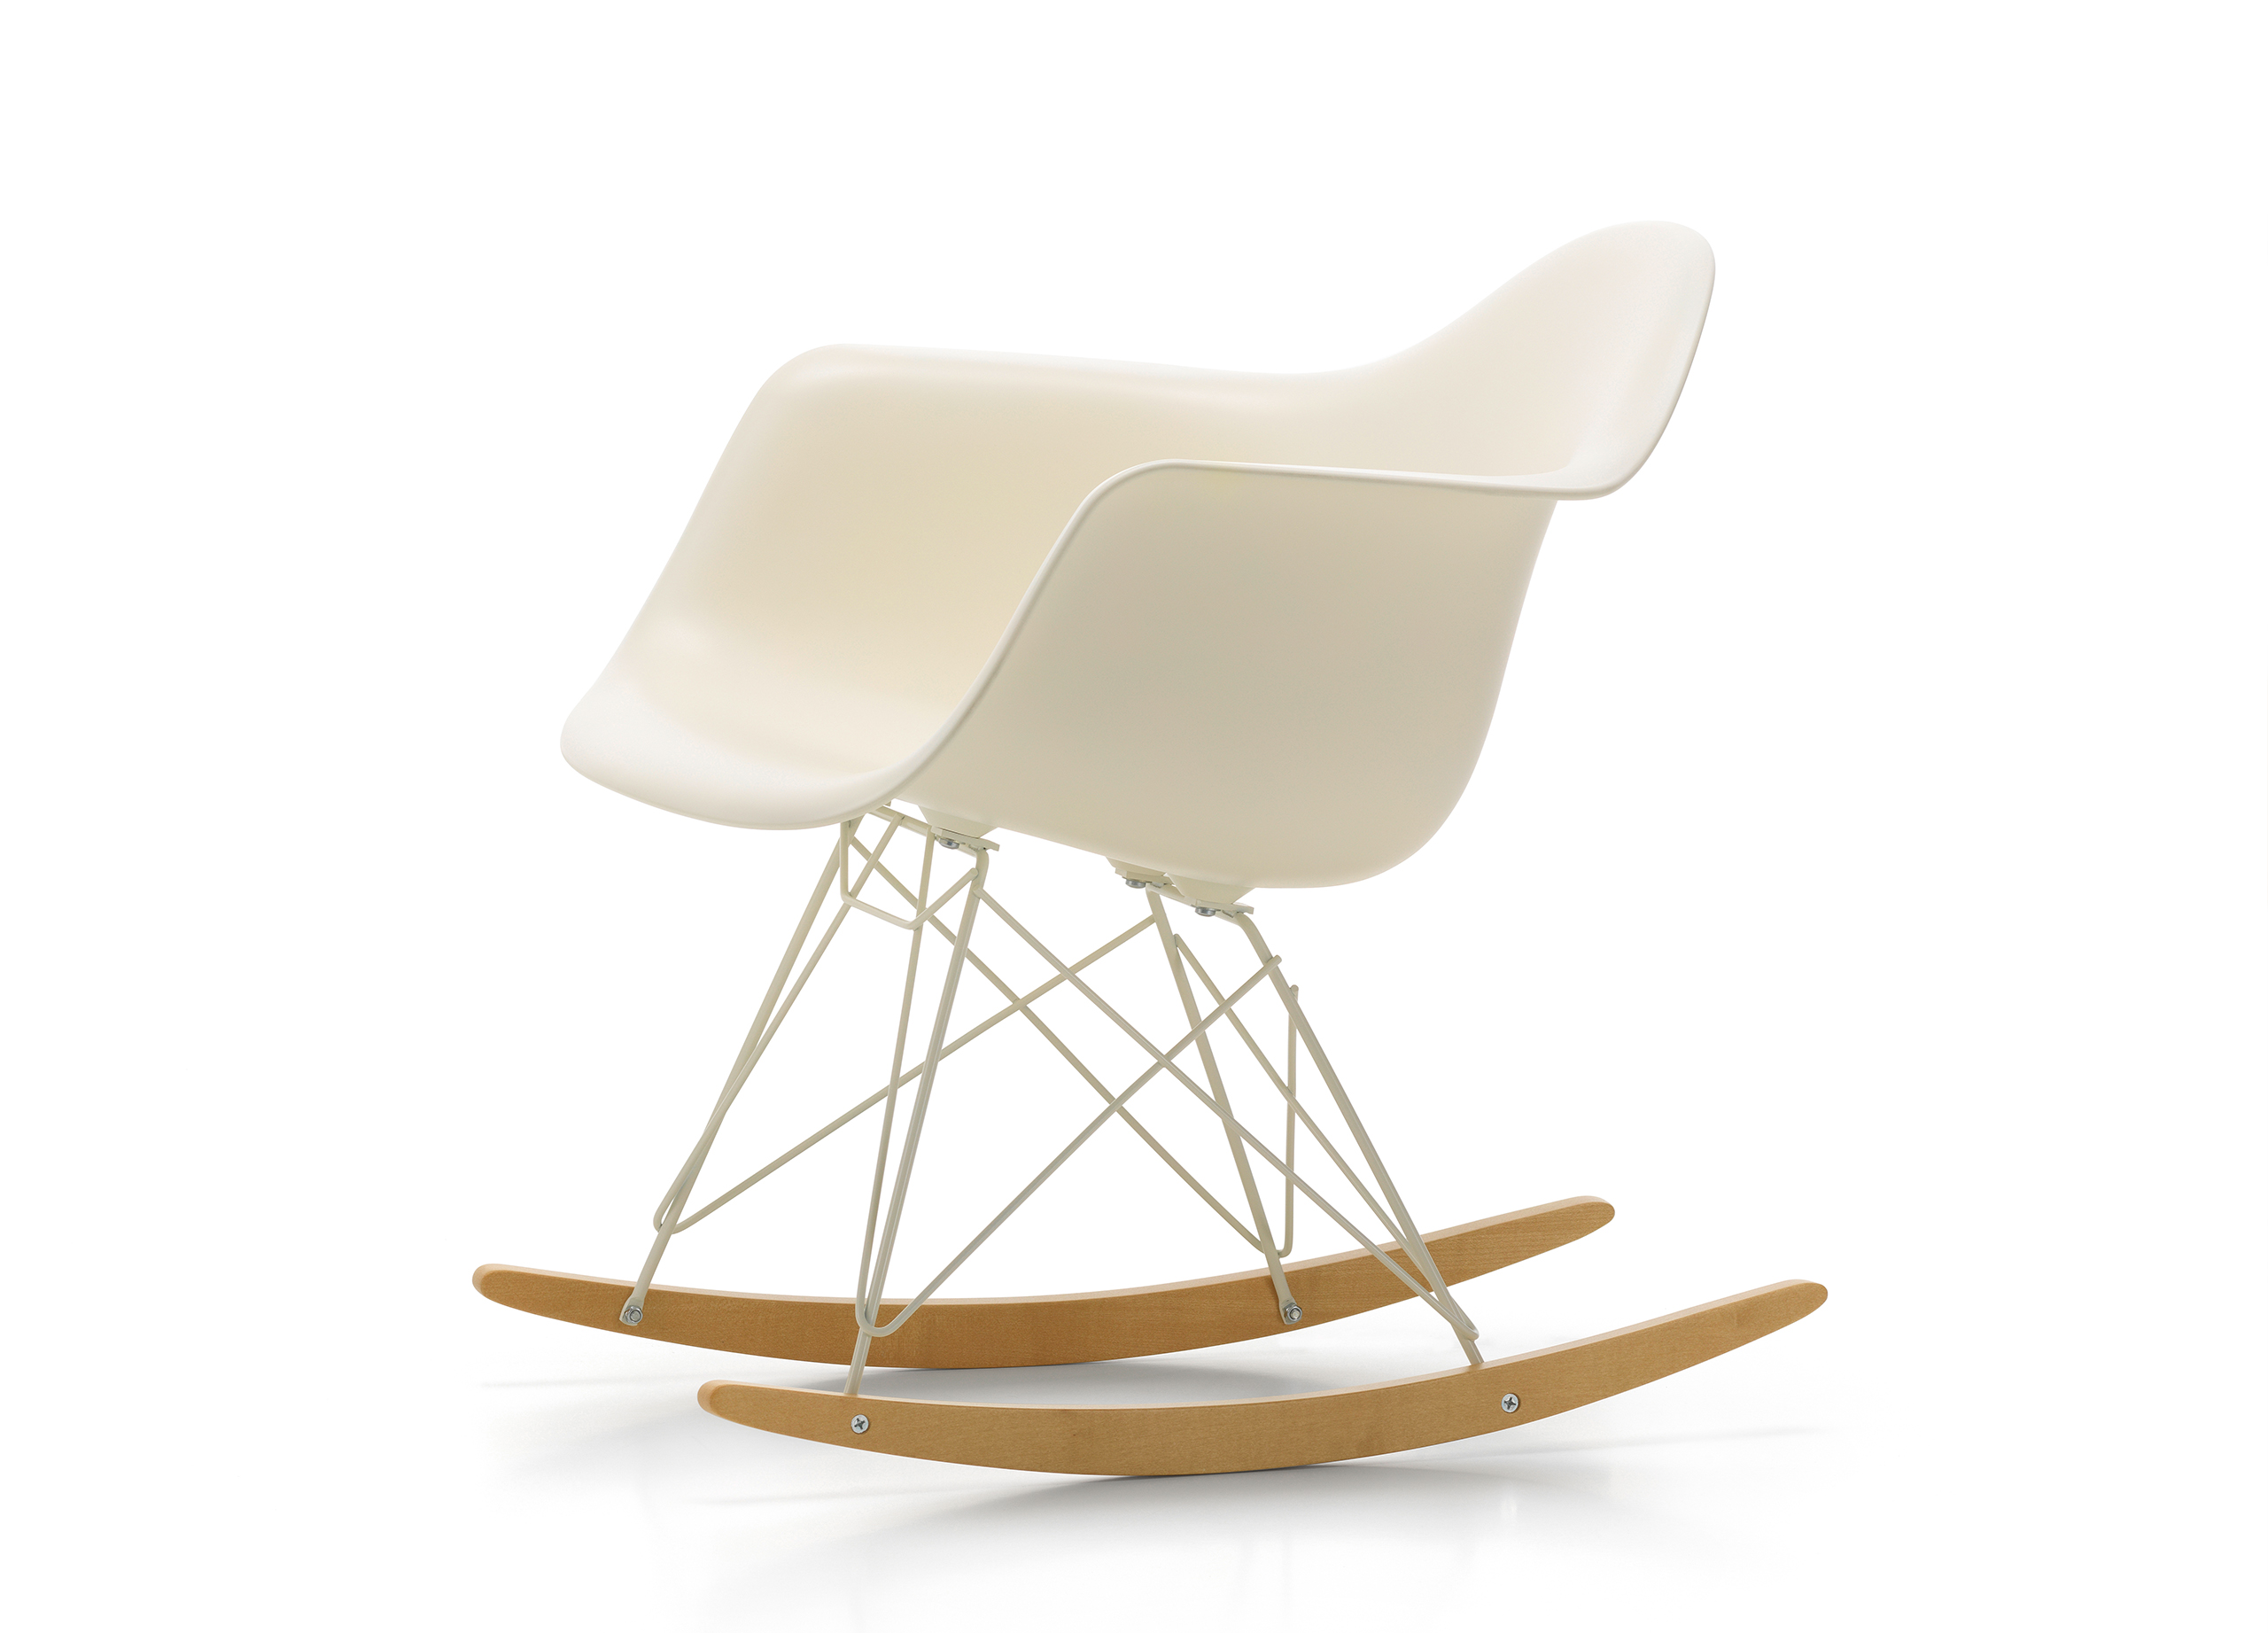 Eames Plastic Armchair : Vitra eames plastic armchair rar limited edition the qvest shop